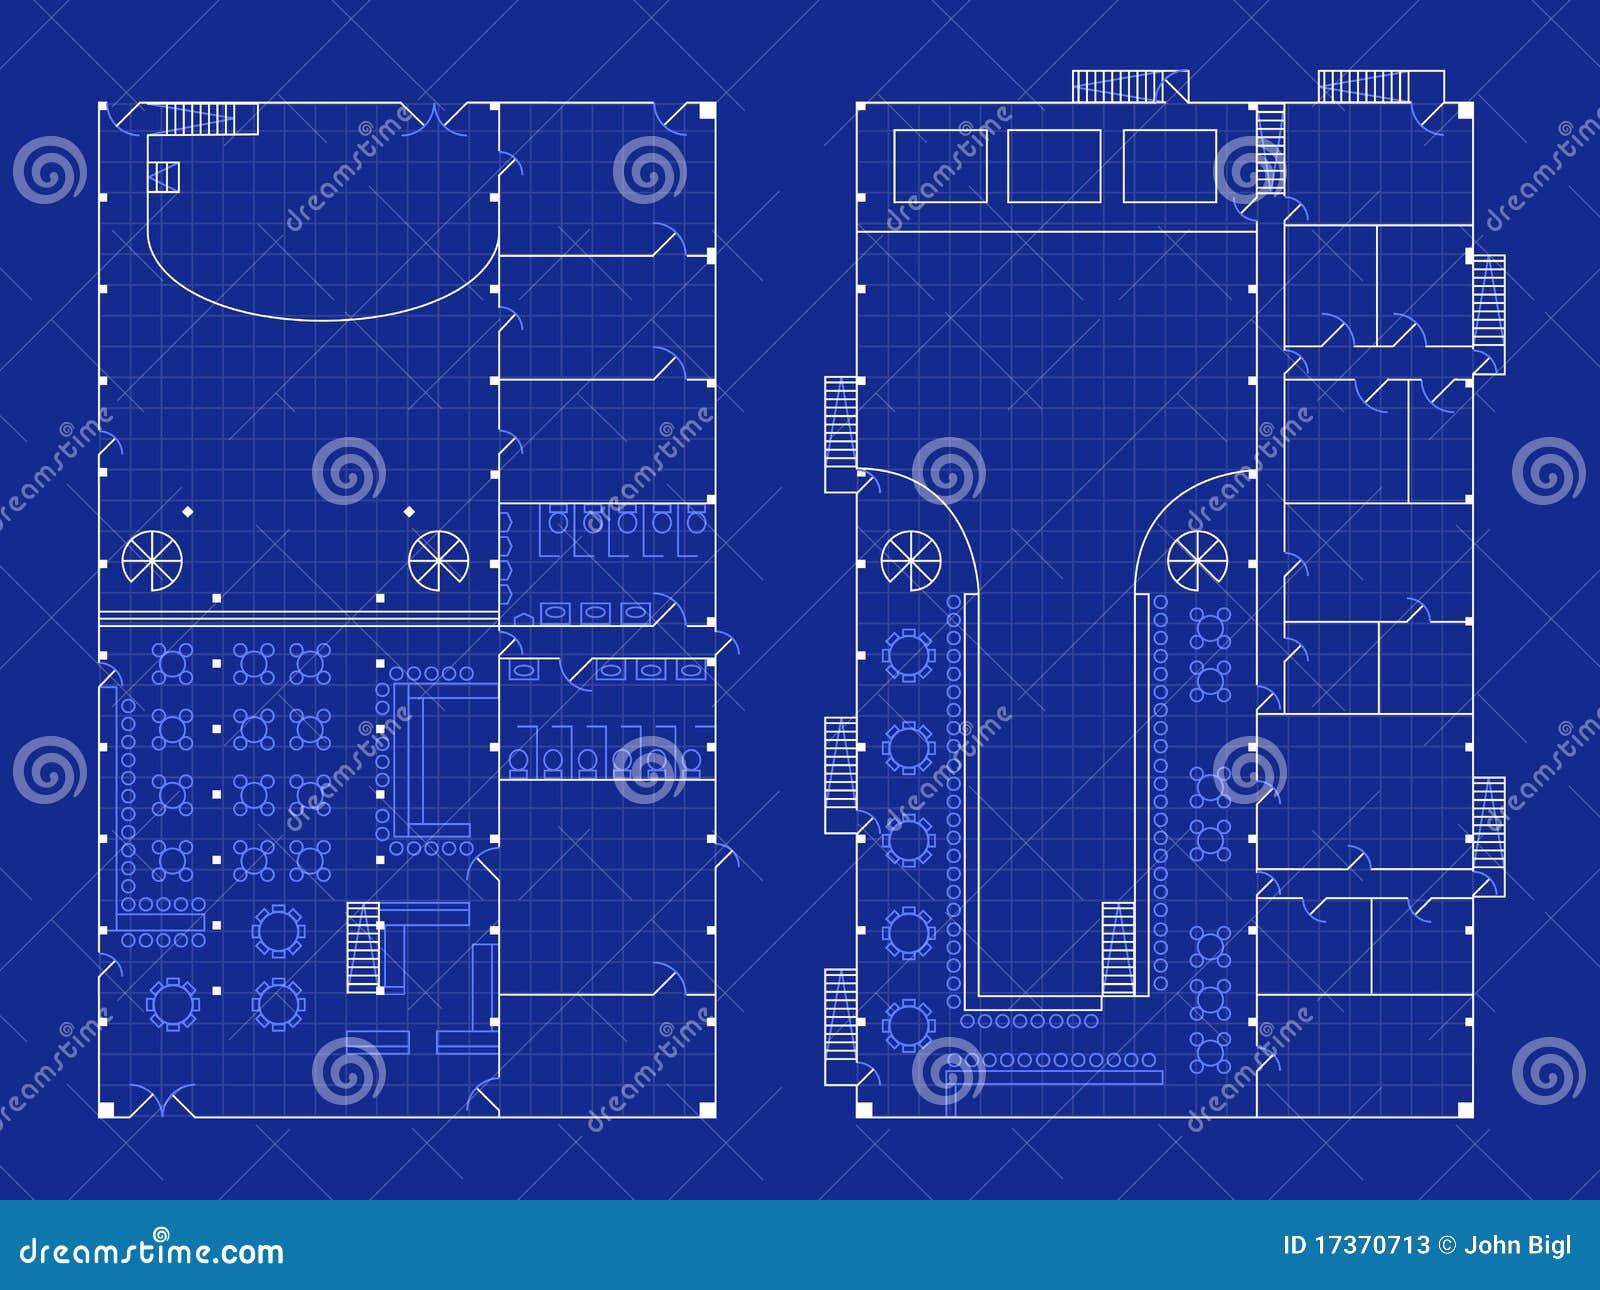 Floor Plan Blueprints Free Simple Nightclub Blueprint Stock Vector Illustration Of